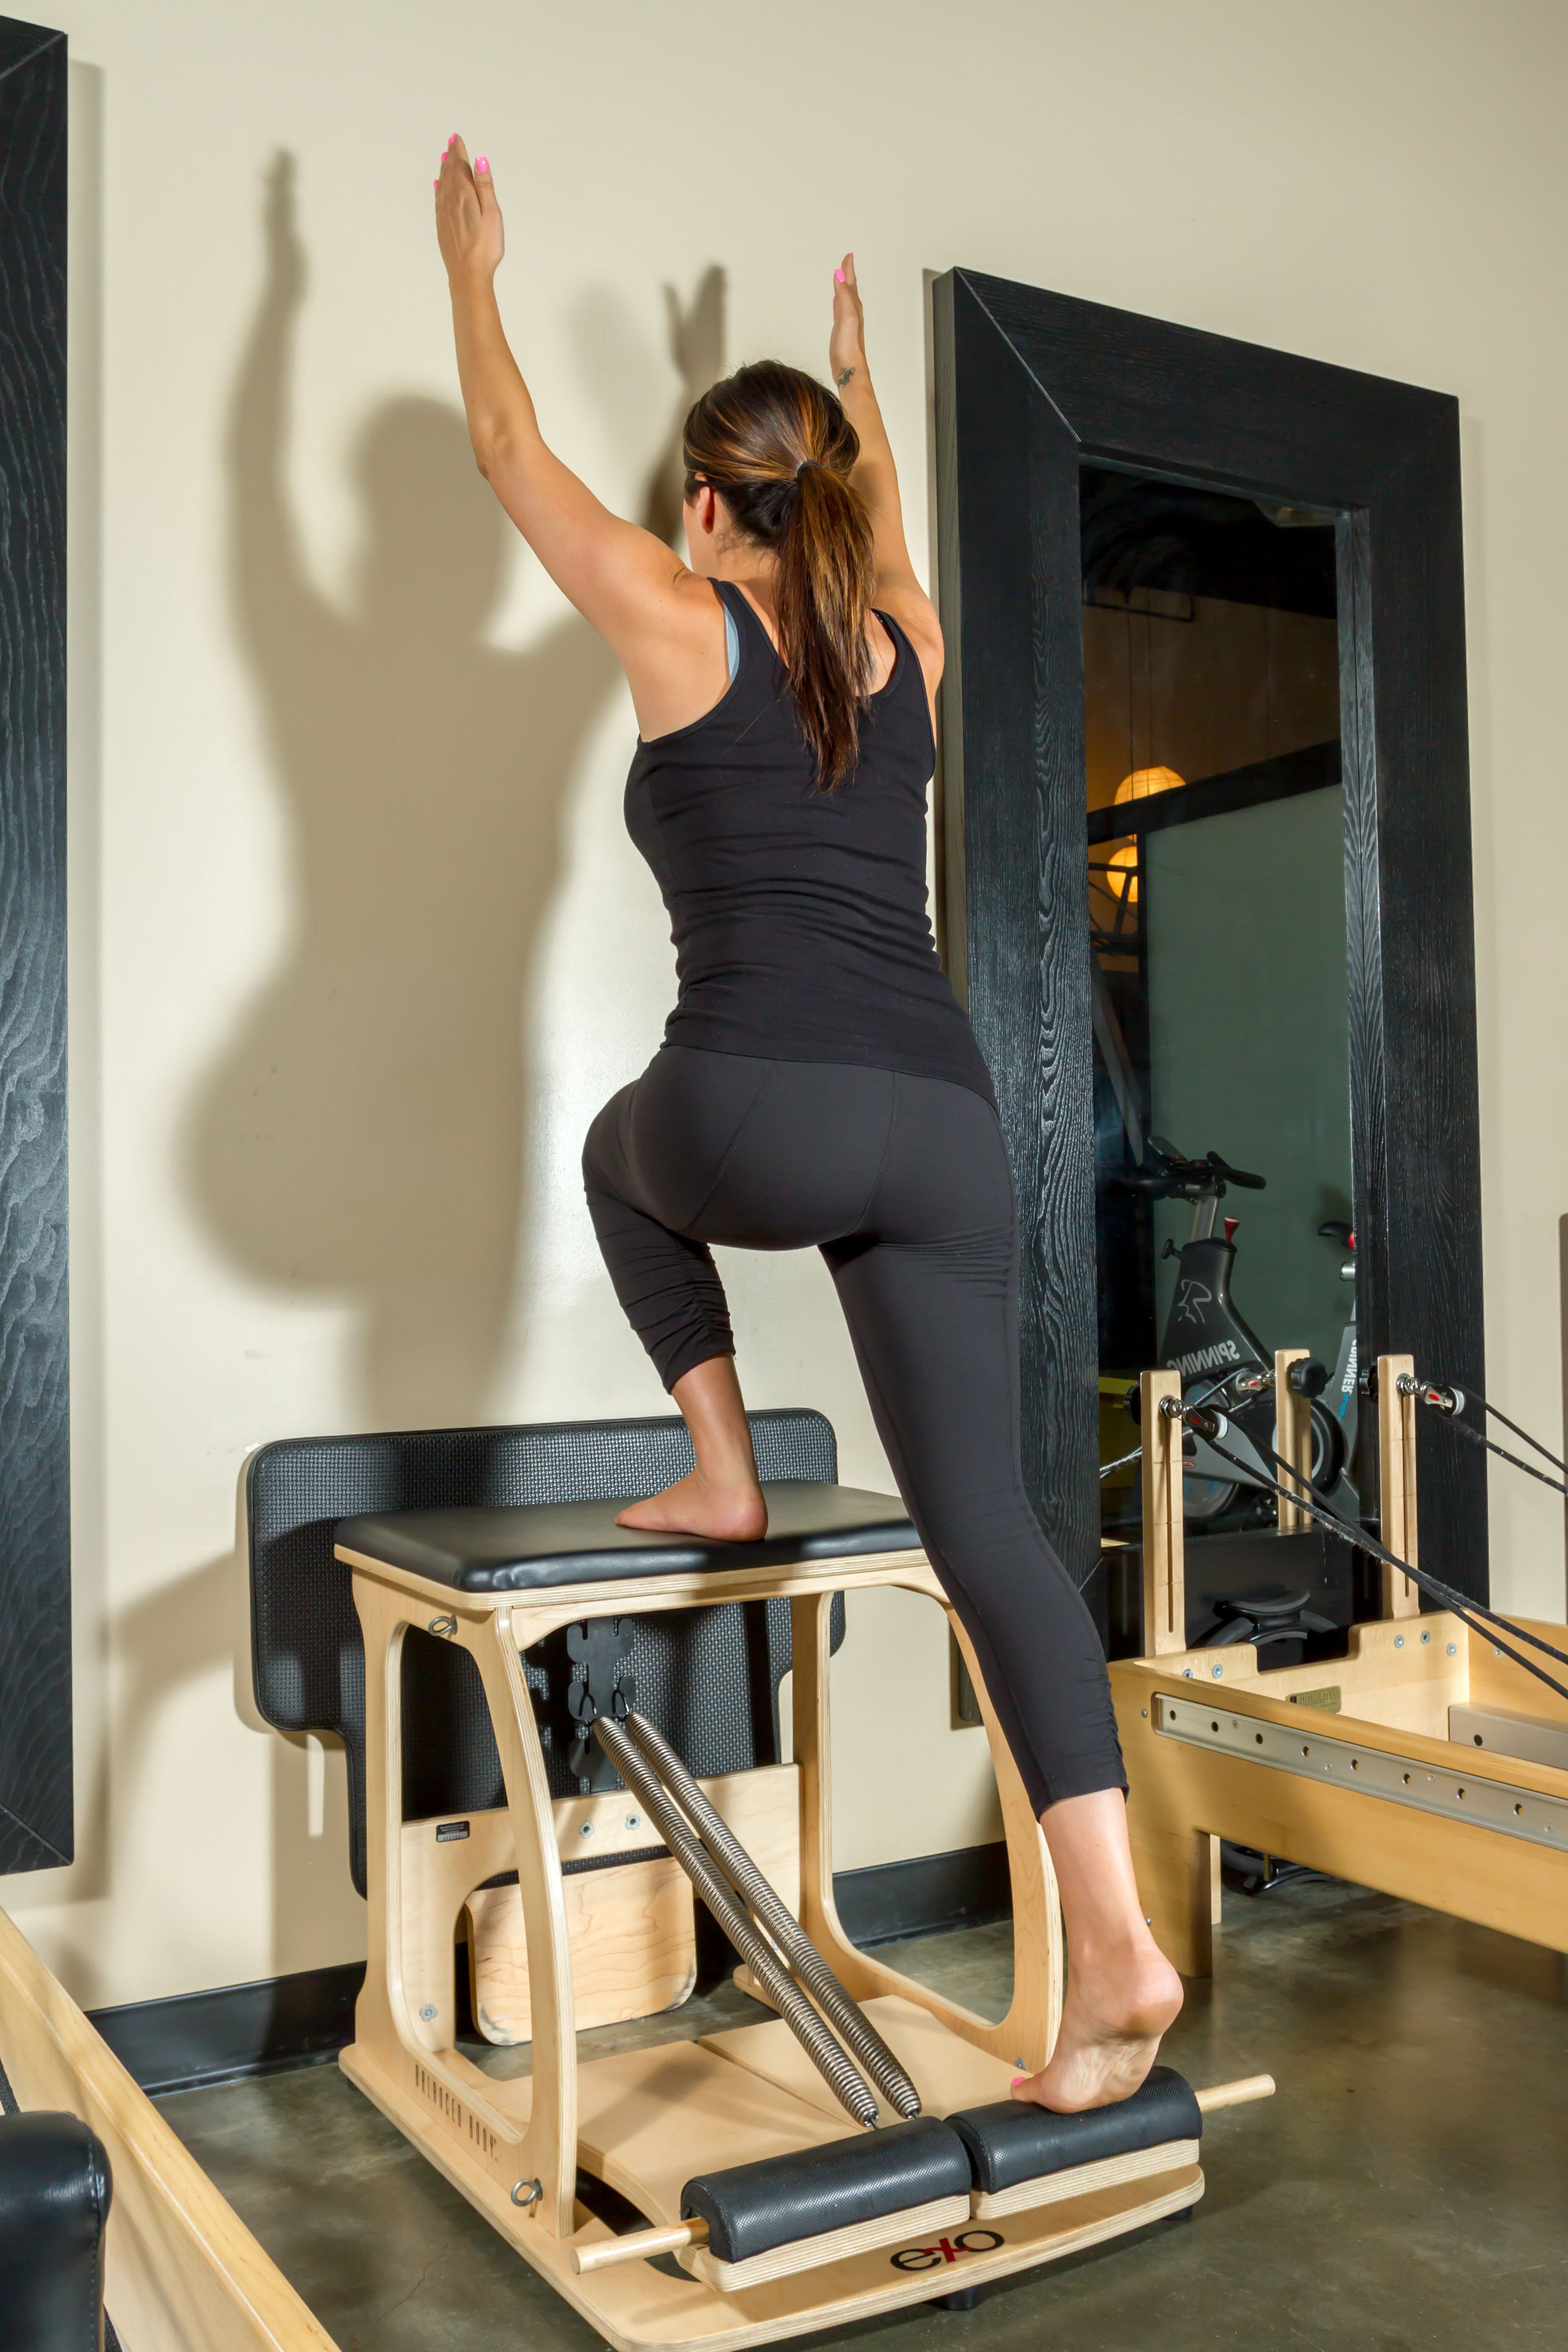 Pilates malibu chair buy malibu chair pilates combo -  Pilates Exo Chair Balance Lunge